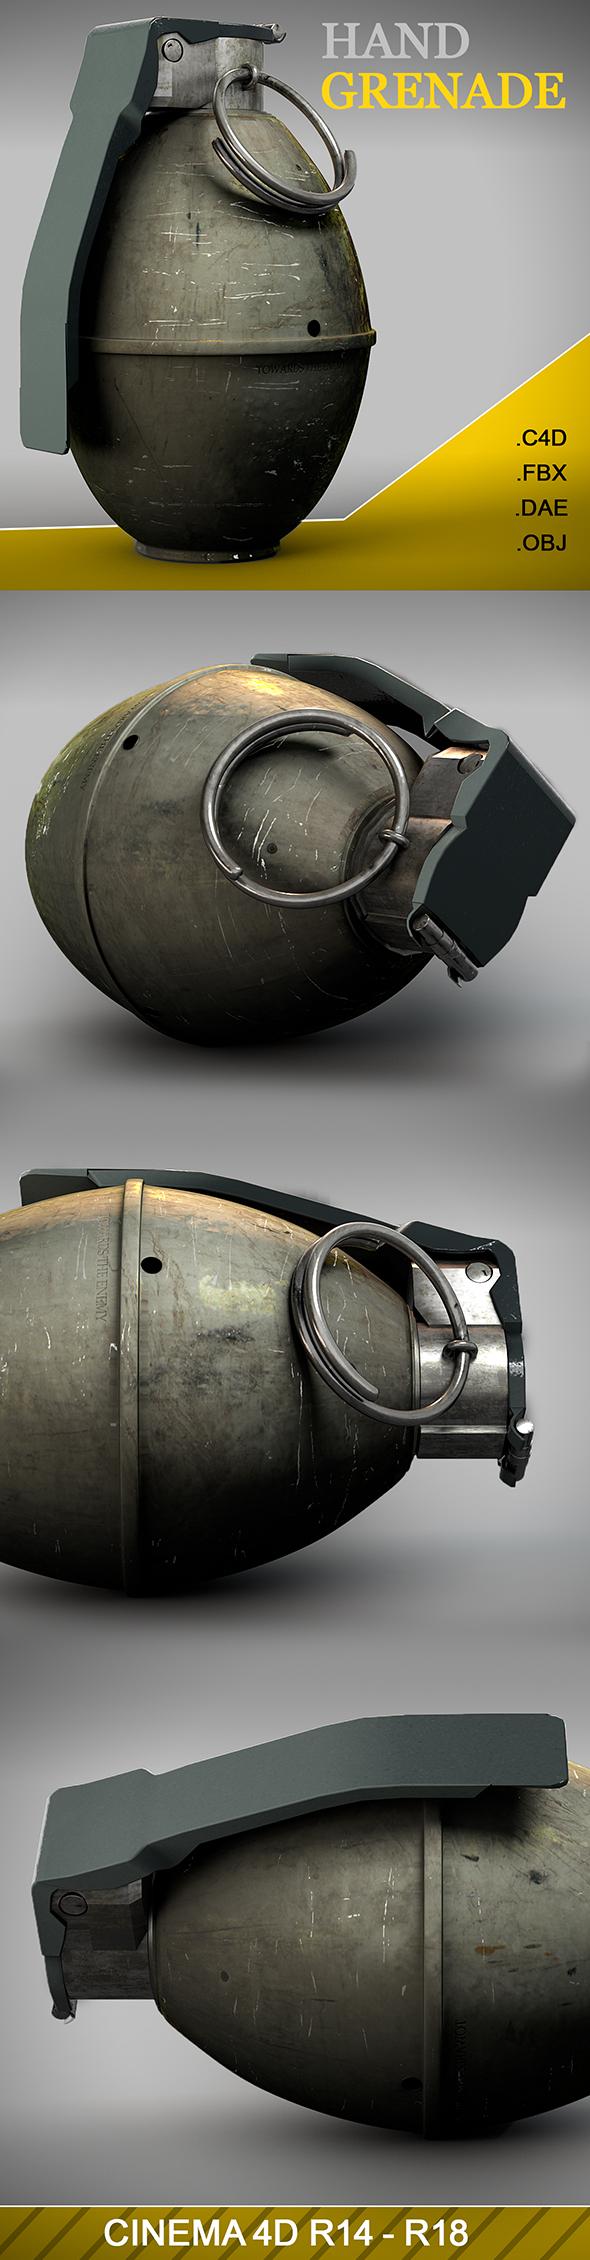 Hand Grenade 3D Model - 3DOcean Item for Sale